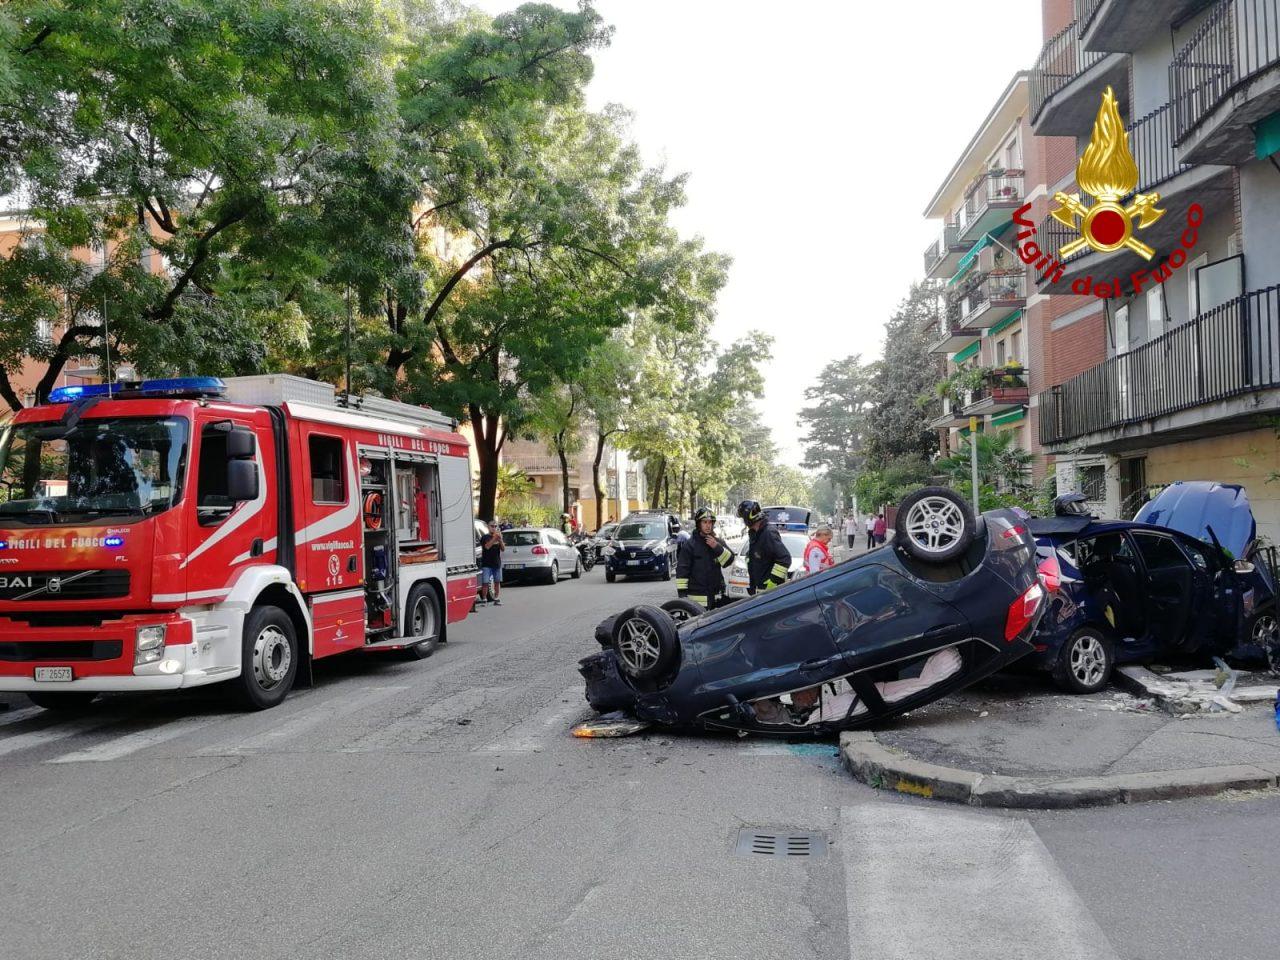 Incidente a Verona, auto ribaltata